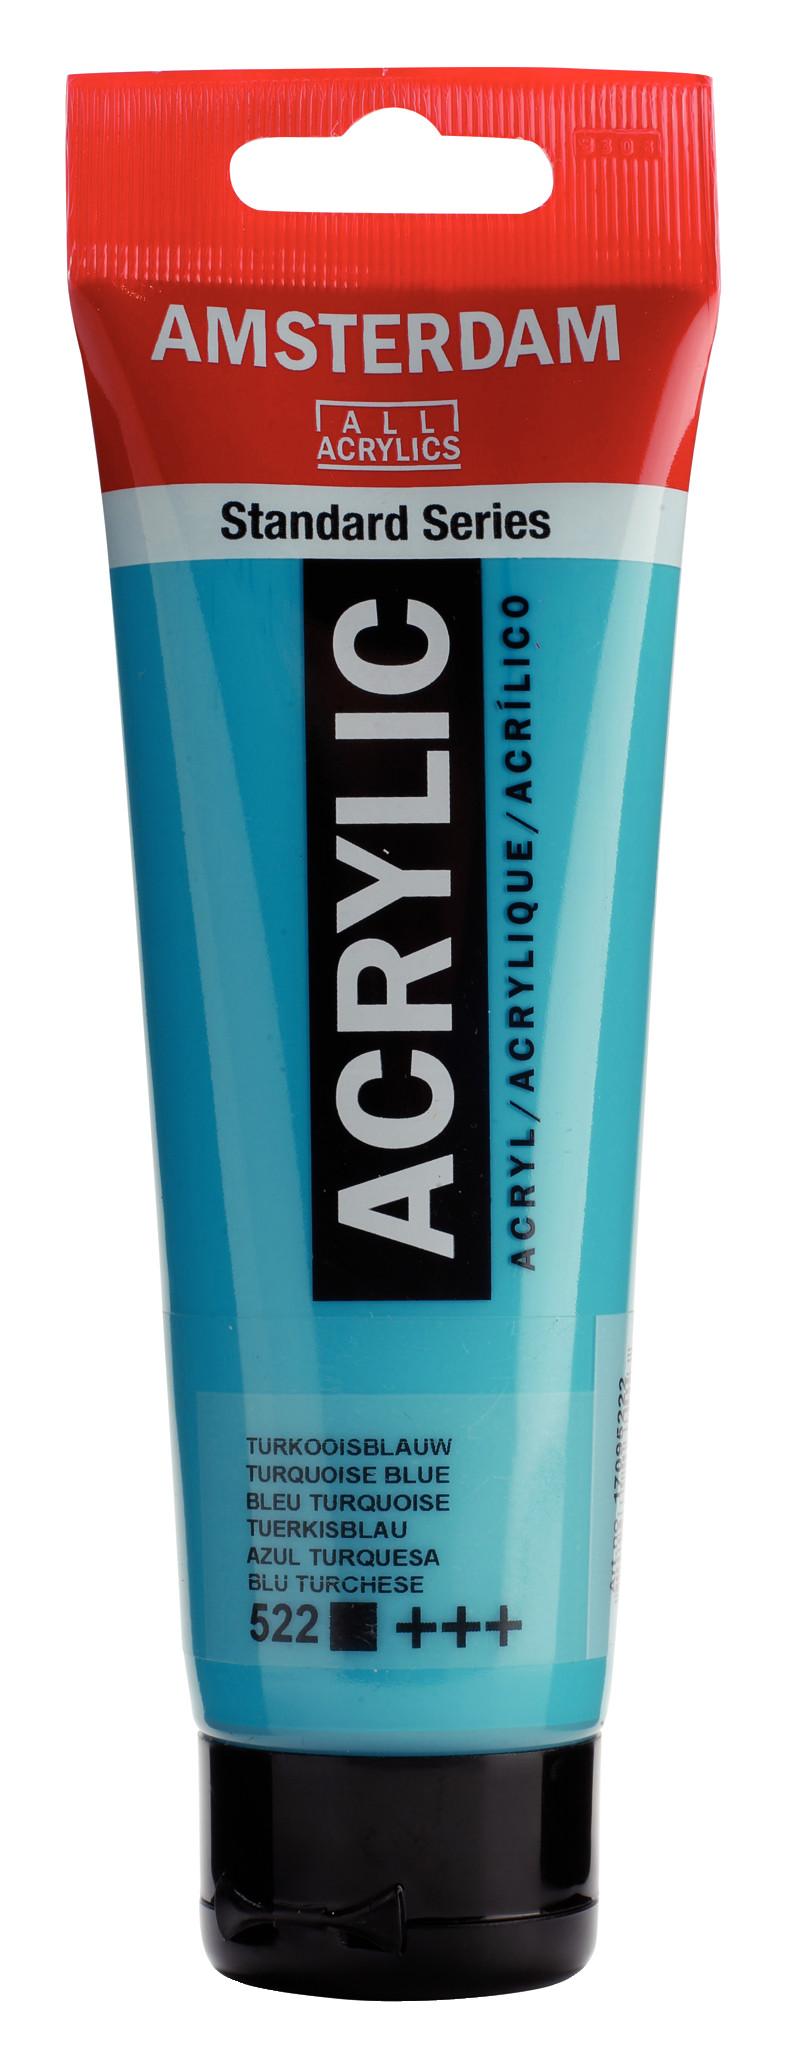 Amsterdam Standard Series Acrylic Tube 120 ml Turquoise blue 522